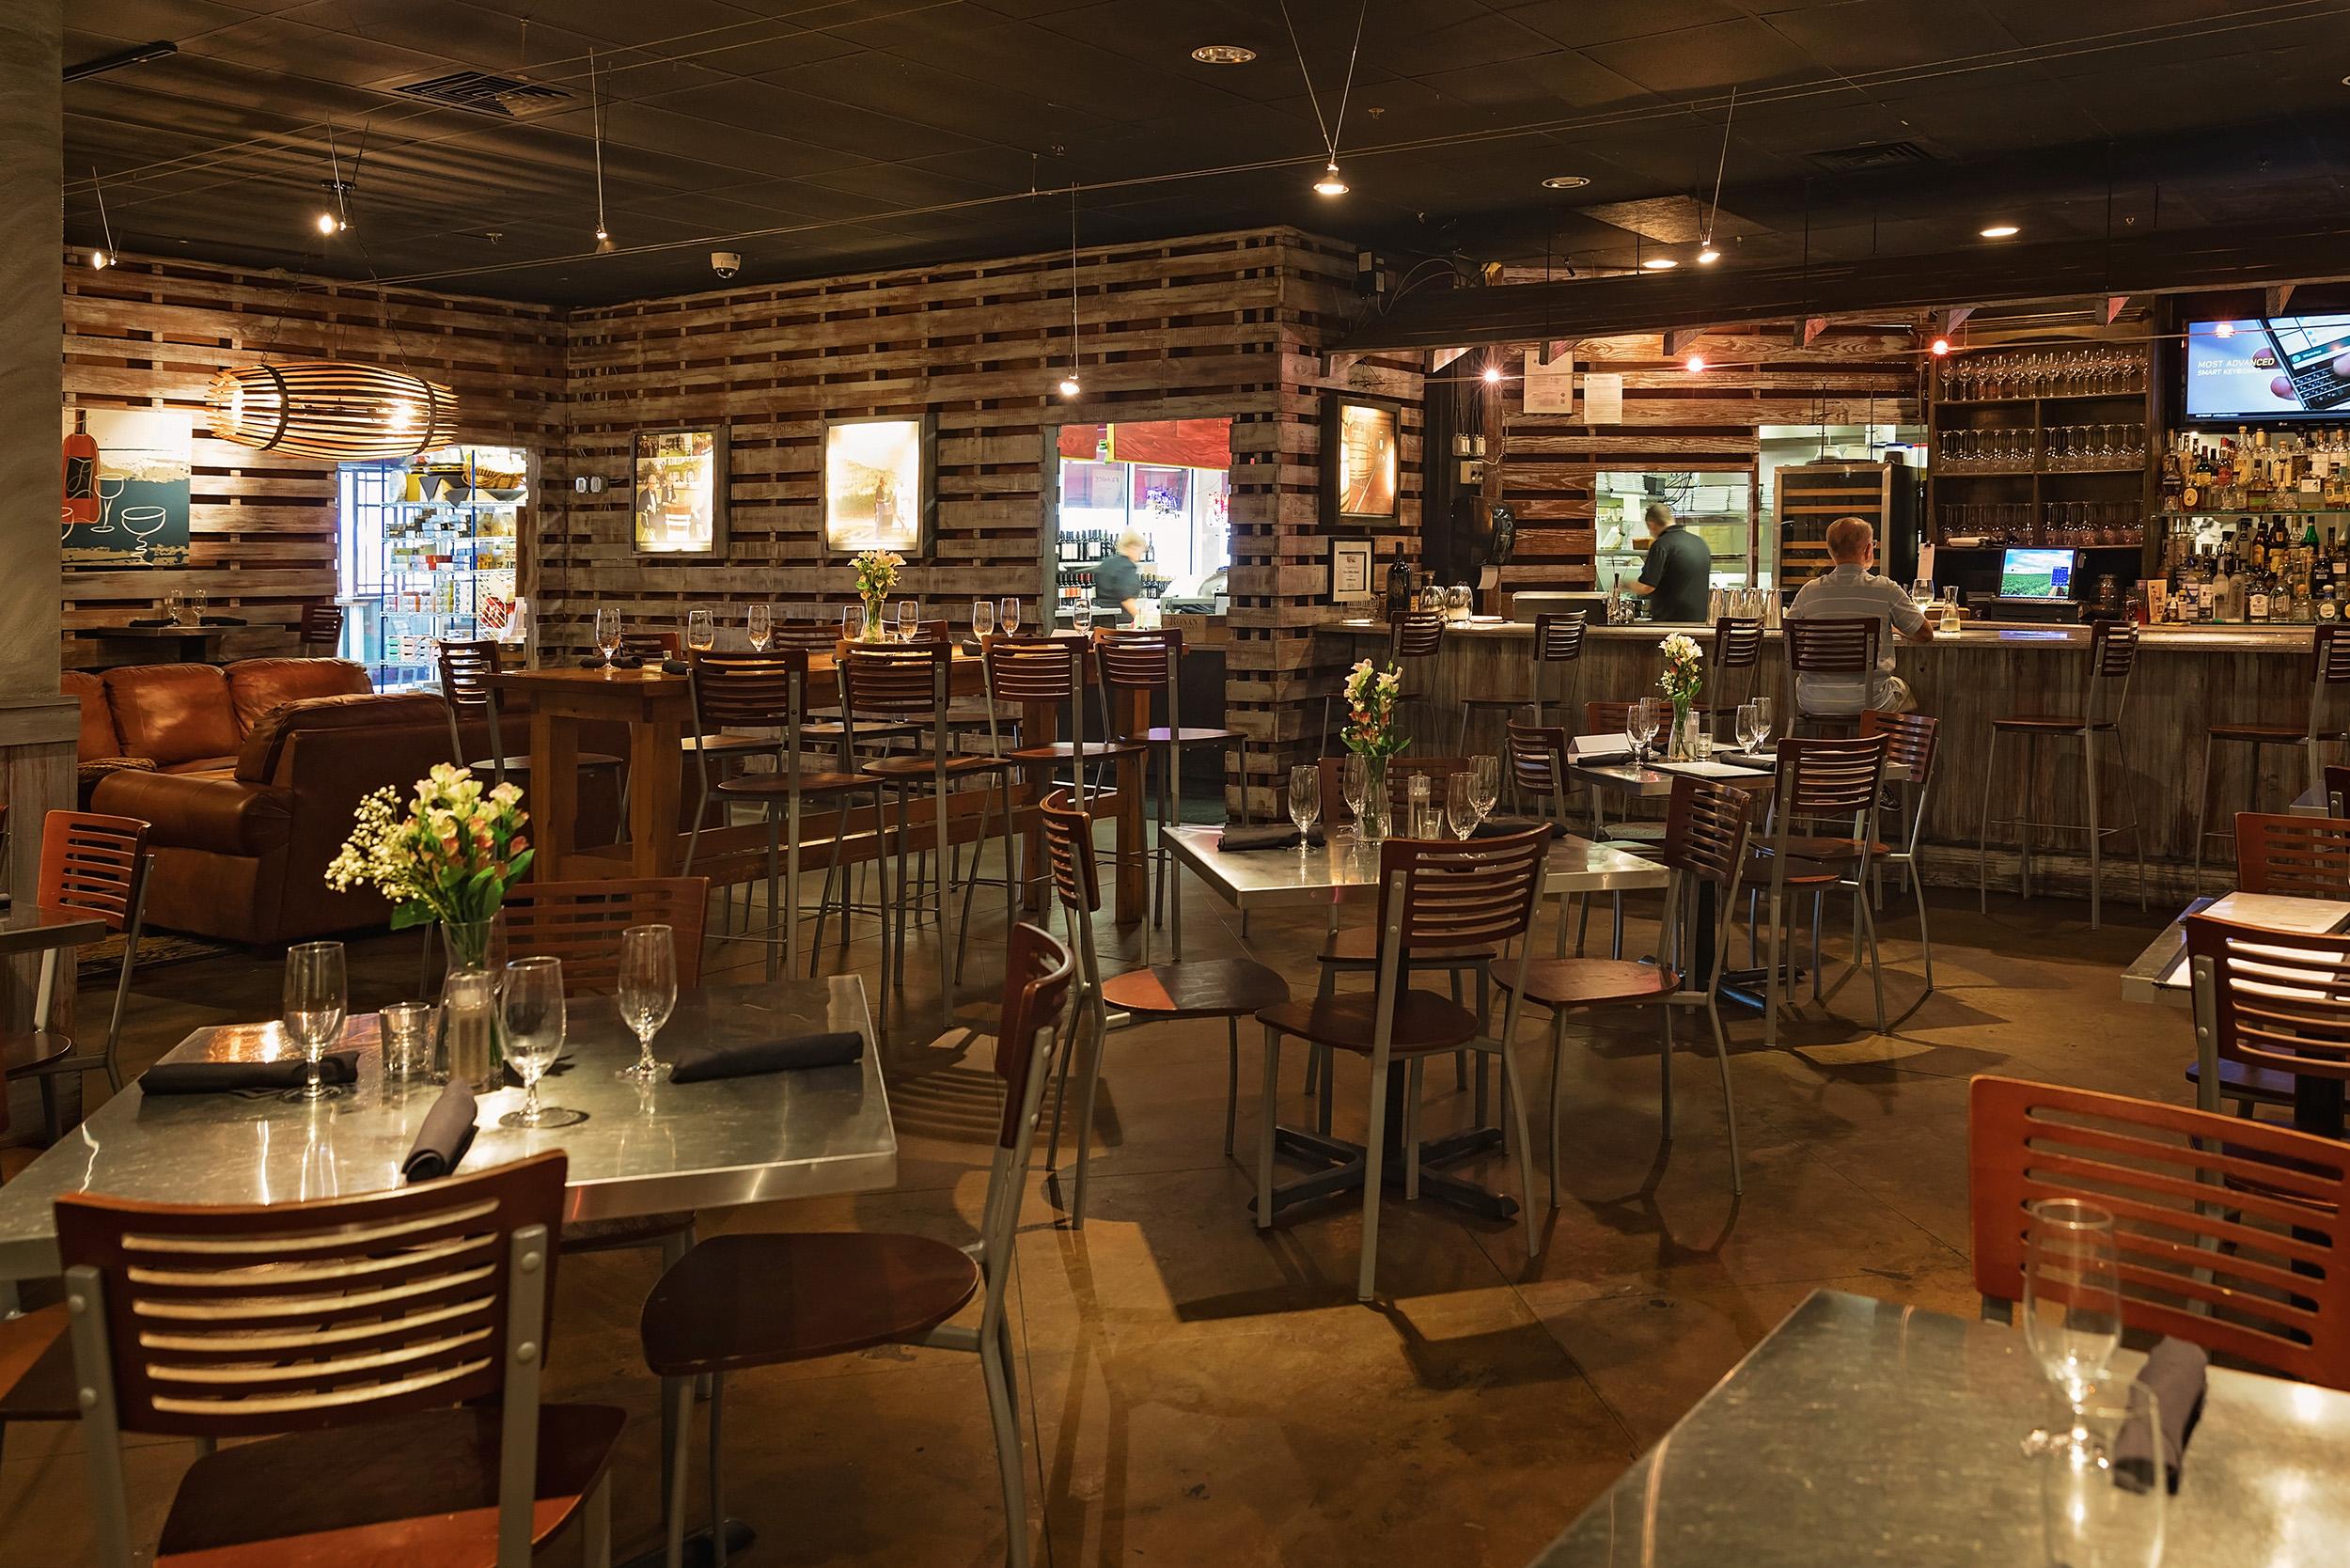 Chans Wine Bar In Destin Florida For Market Watch Magazine And